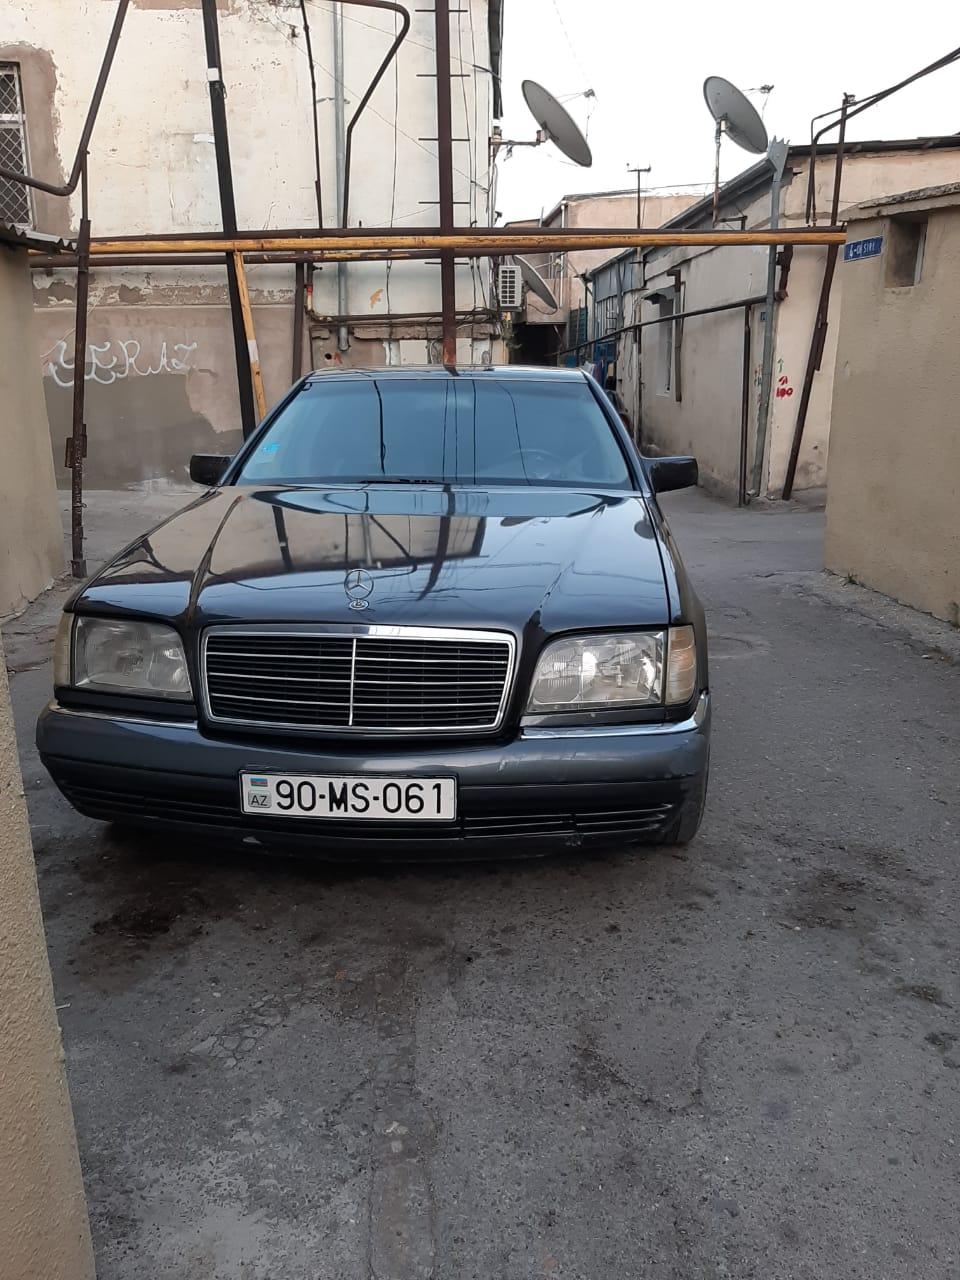 Mercedes-Benz S 320 3.2(lt) 1995 İkinci əl  $5000